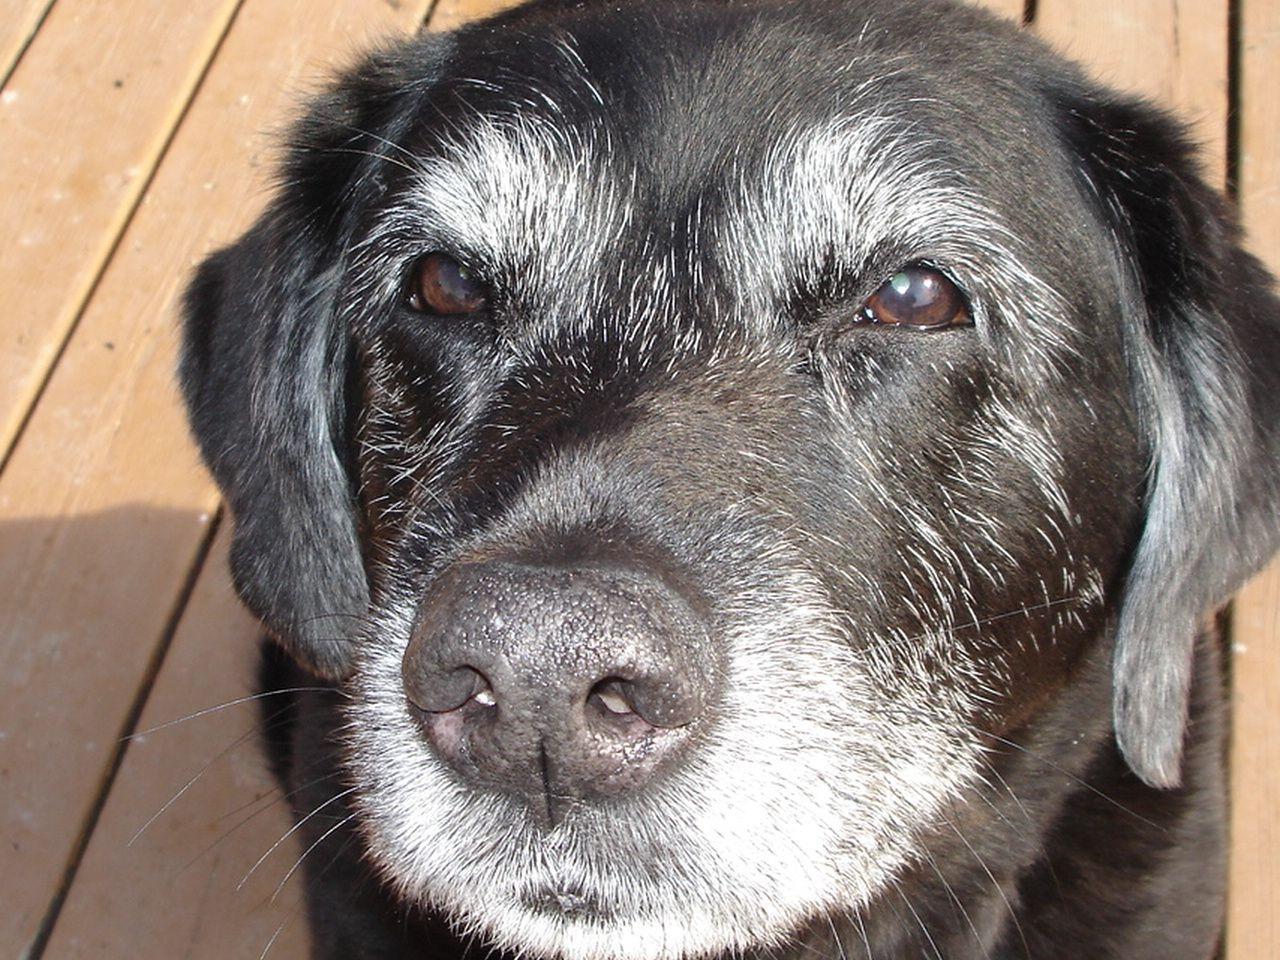 Homemade dog food dehydrated dog food is an easy nutritious homemade dog food dehydrated dog food is an easy nutritious high quality way forumfinder Choice Image